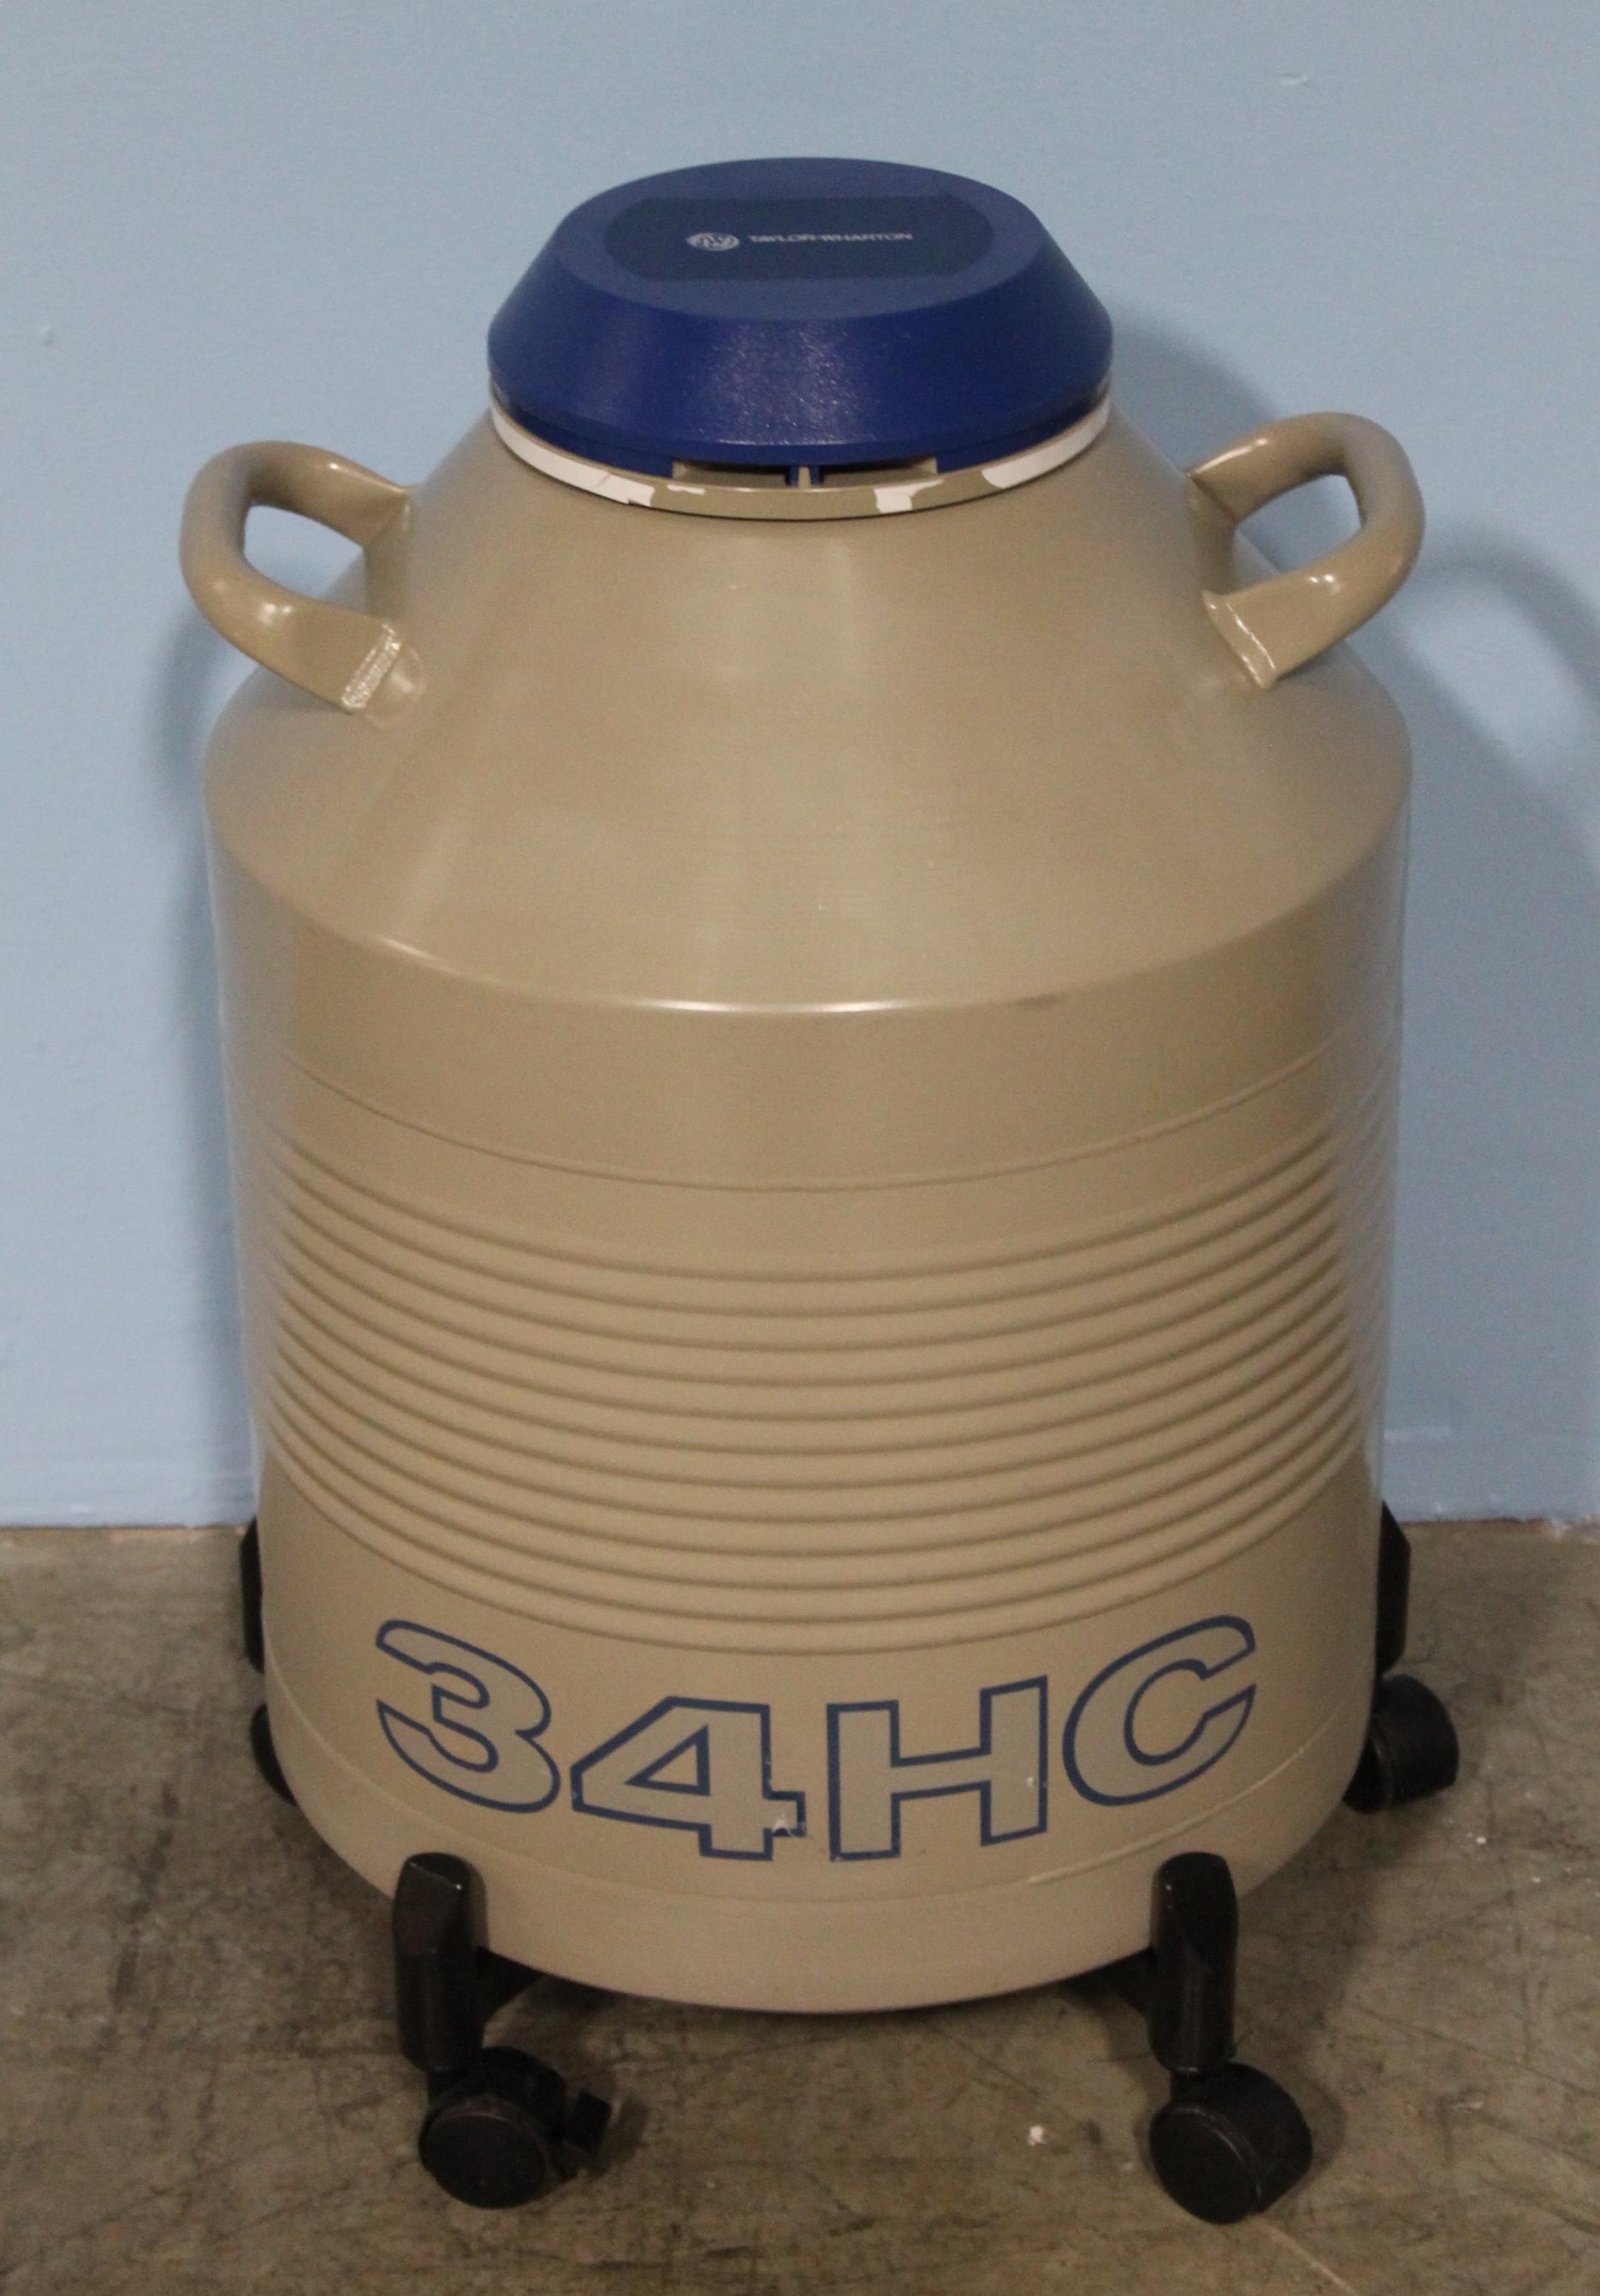 Refurbished Taylor Wharton 34HC Cryogenic Storage Dewar